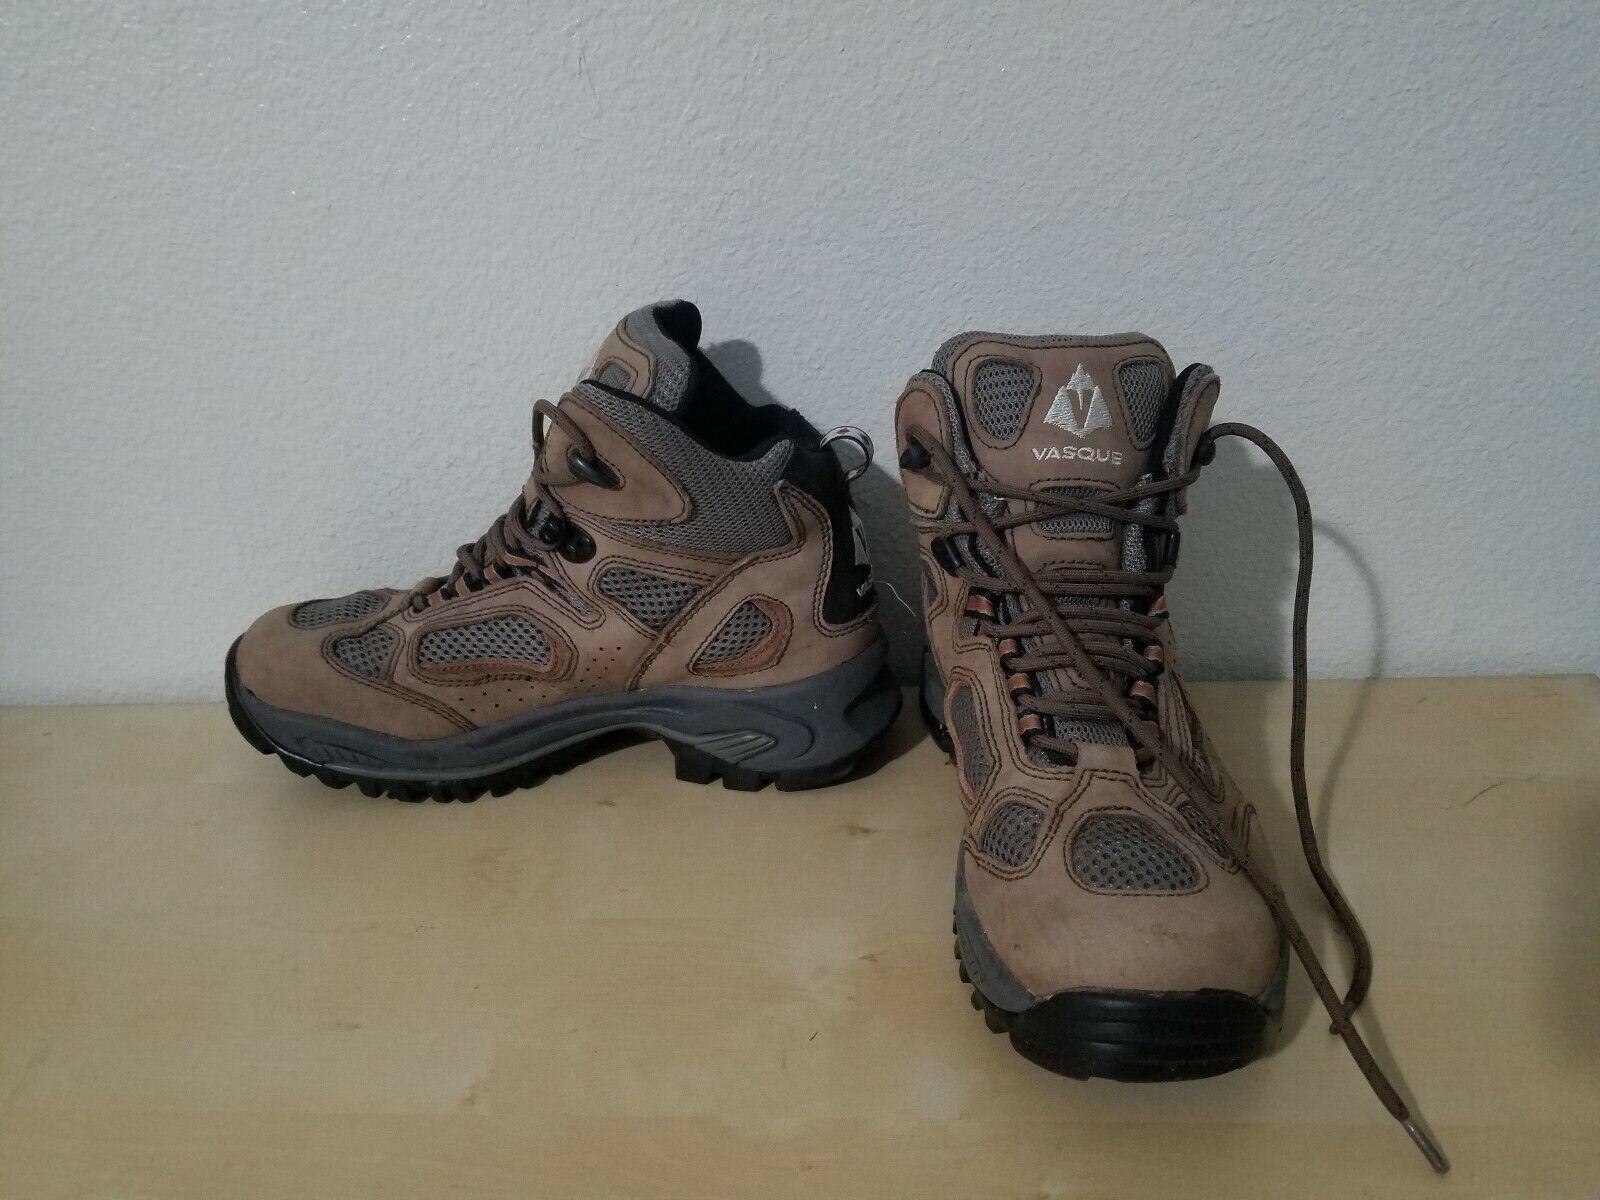 Vasque Breeze 7466 Mens Sz 7 M US Hiking Trail Boots Leather Gore-Tex Waterproof